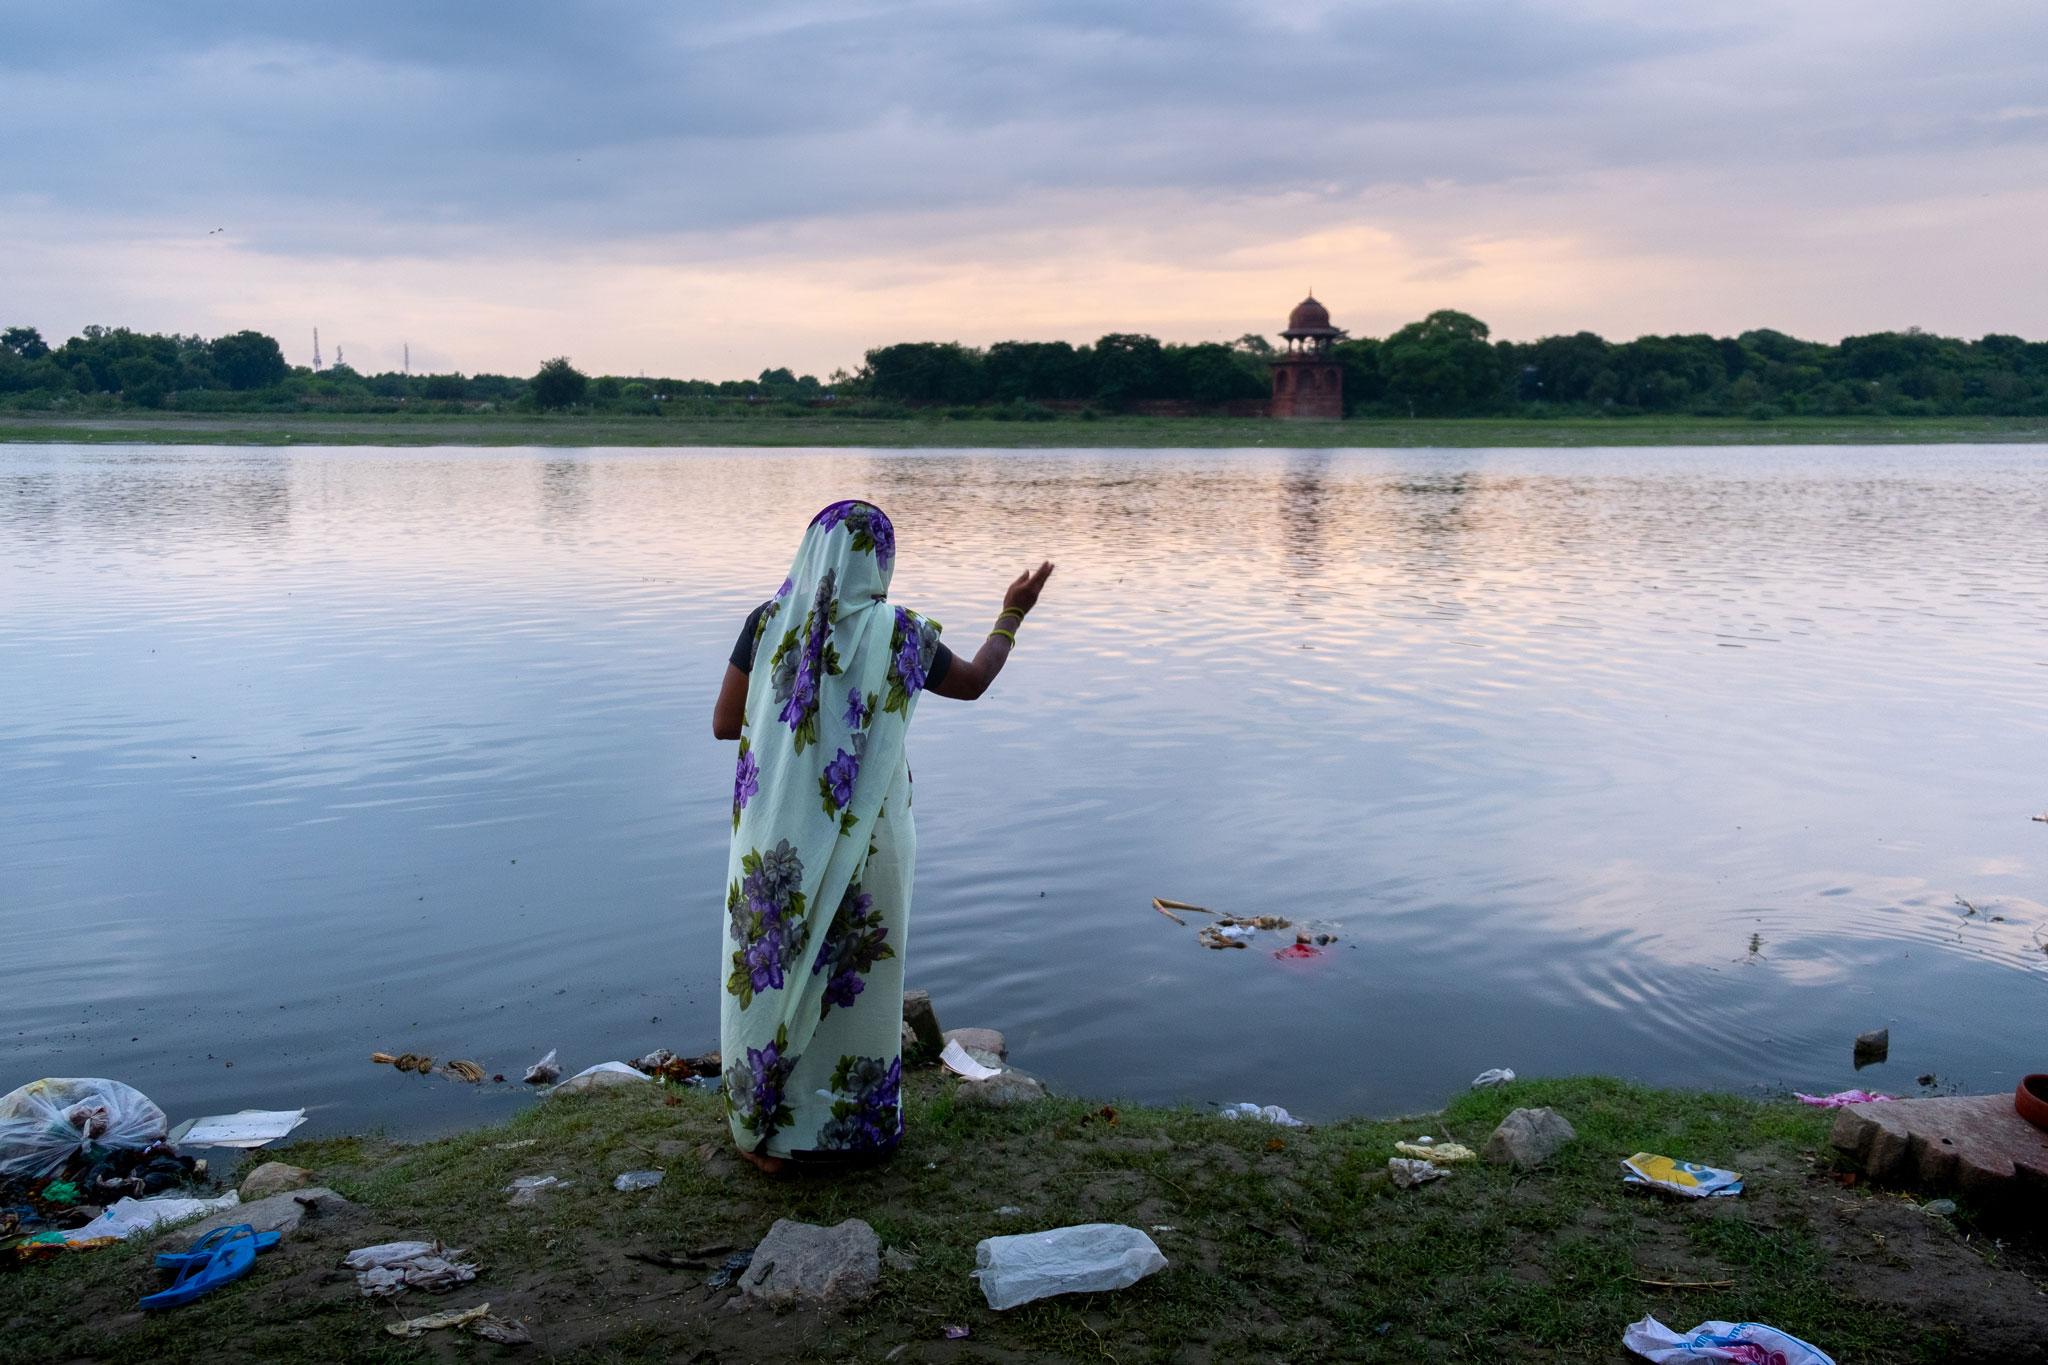 POLLUTION AND TRADITIONAL LIFE AT THE TAJ MAHAL